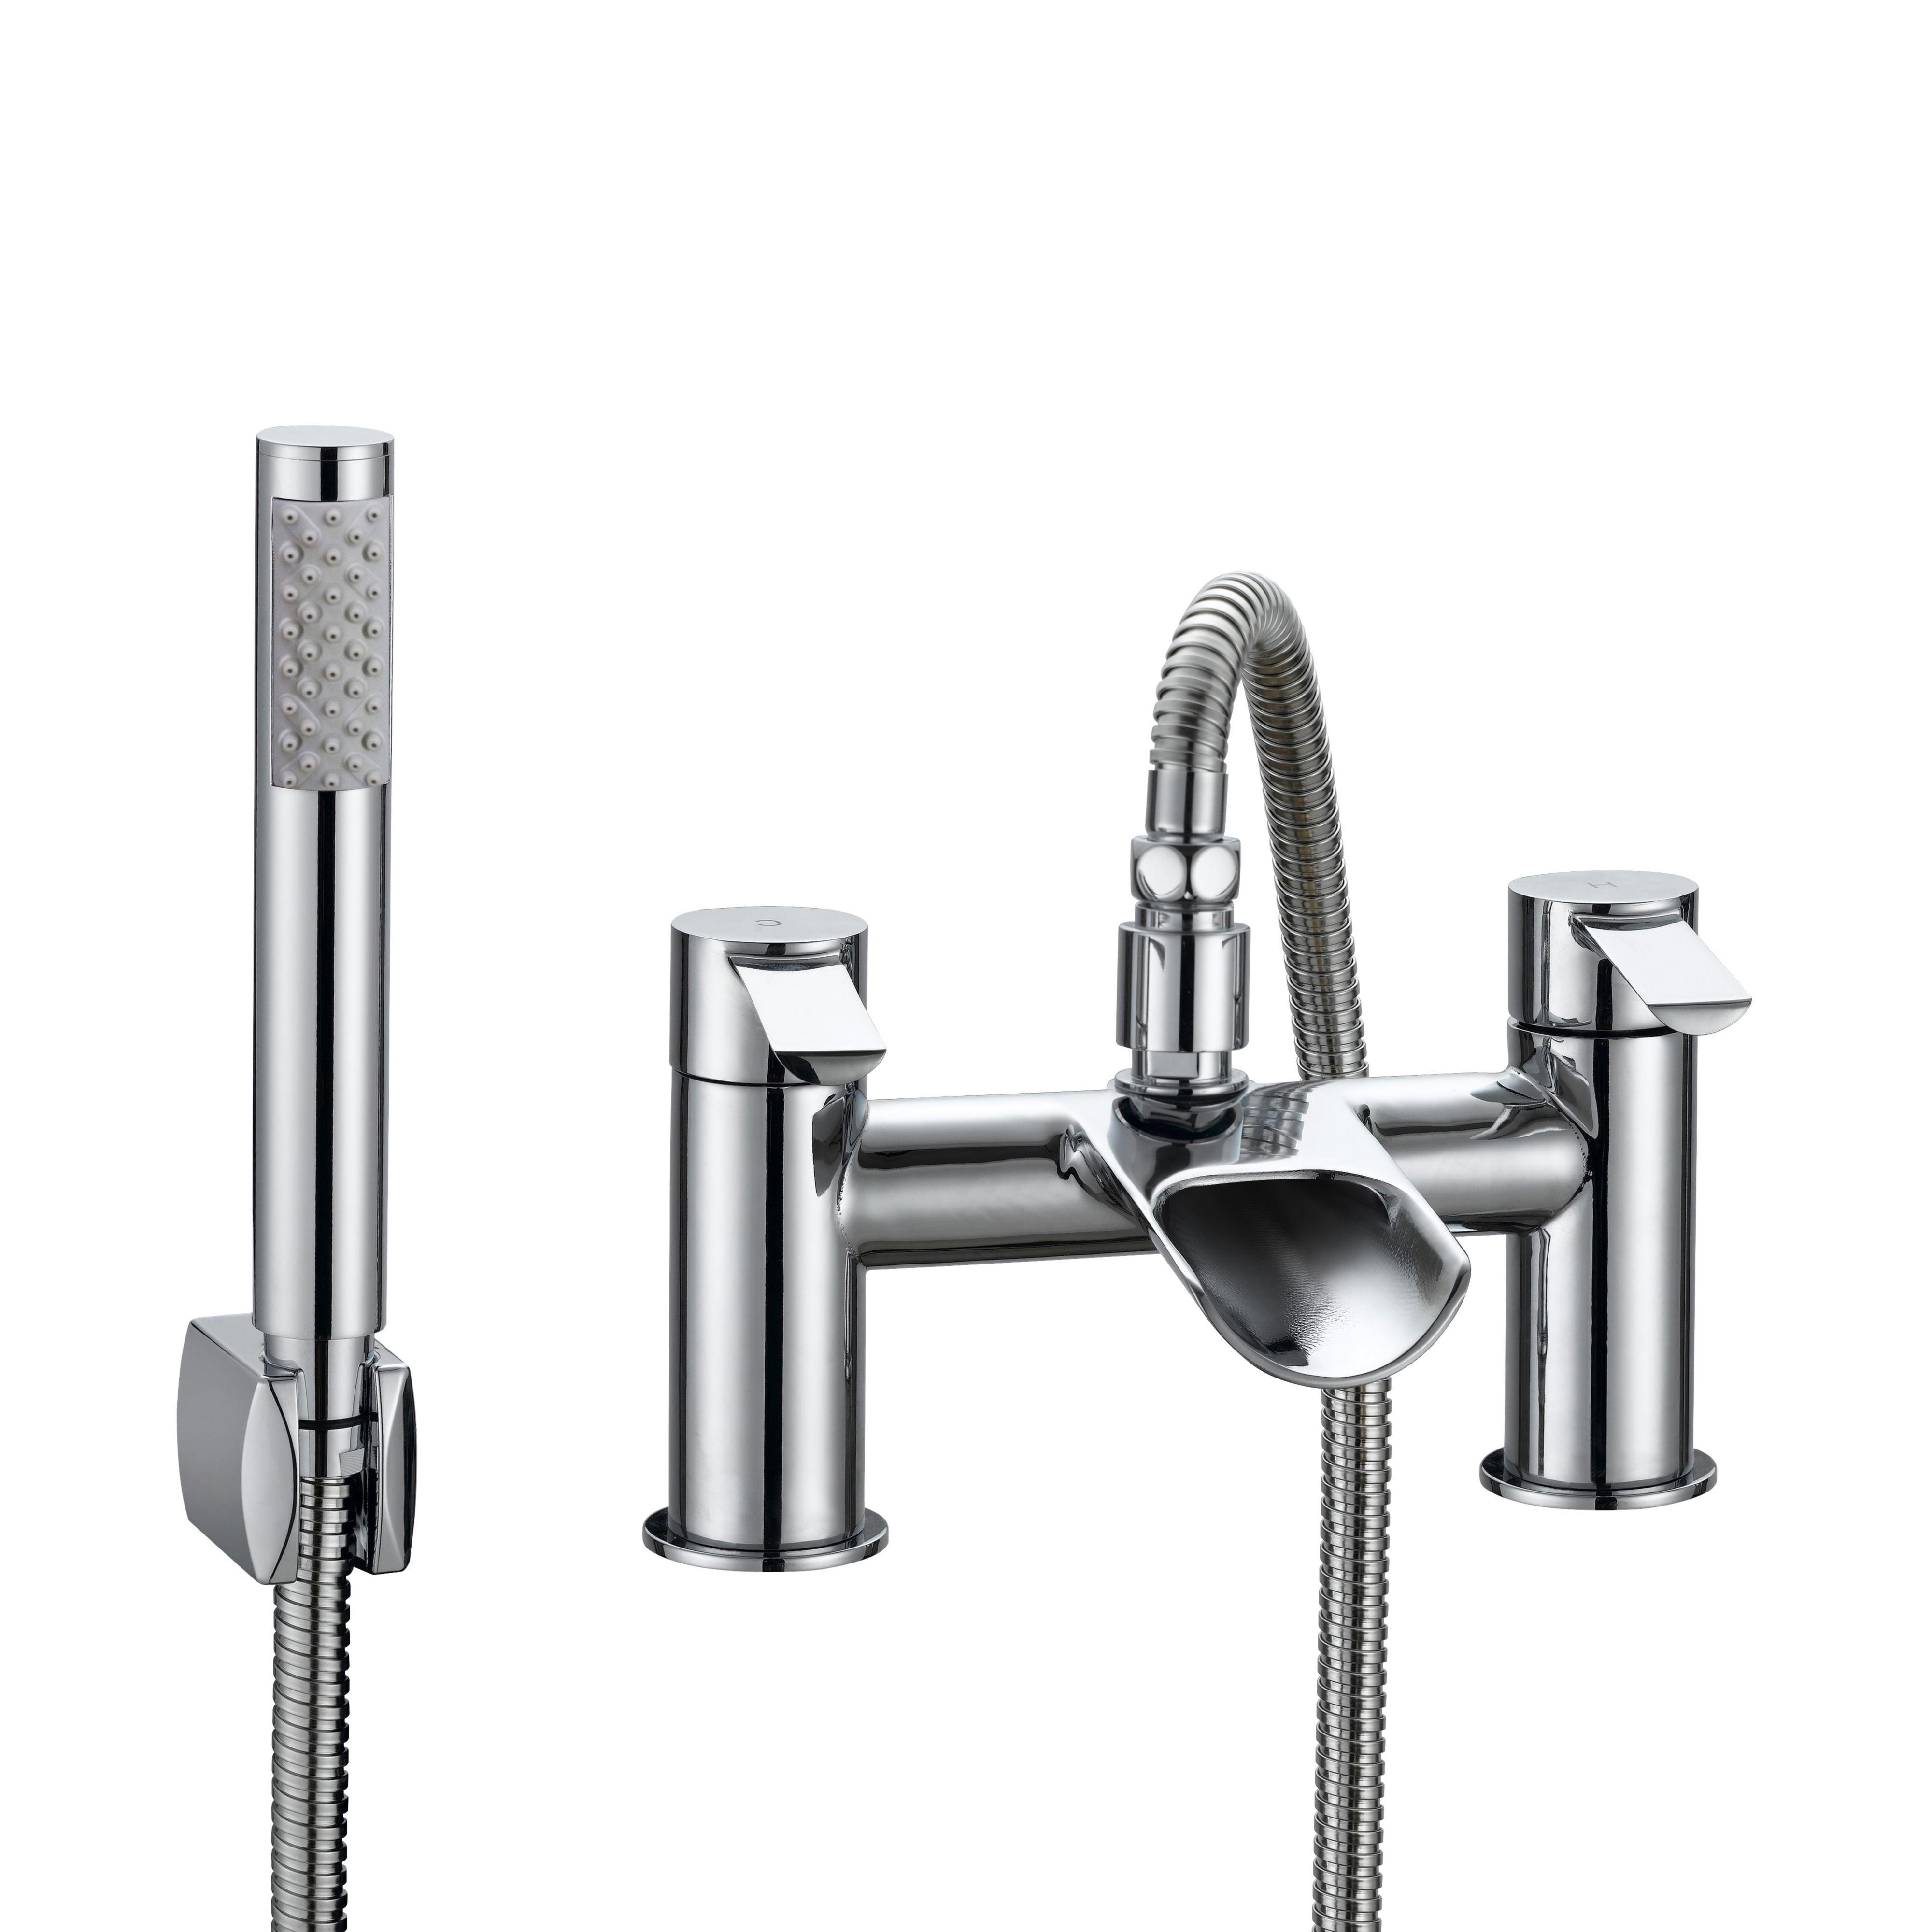 Cooke & Lewis Bamboo Chrome Bath shower mixer tap | Bath shower ...